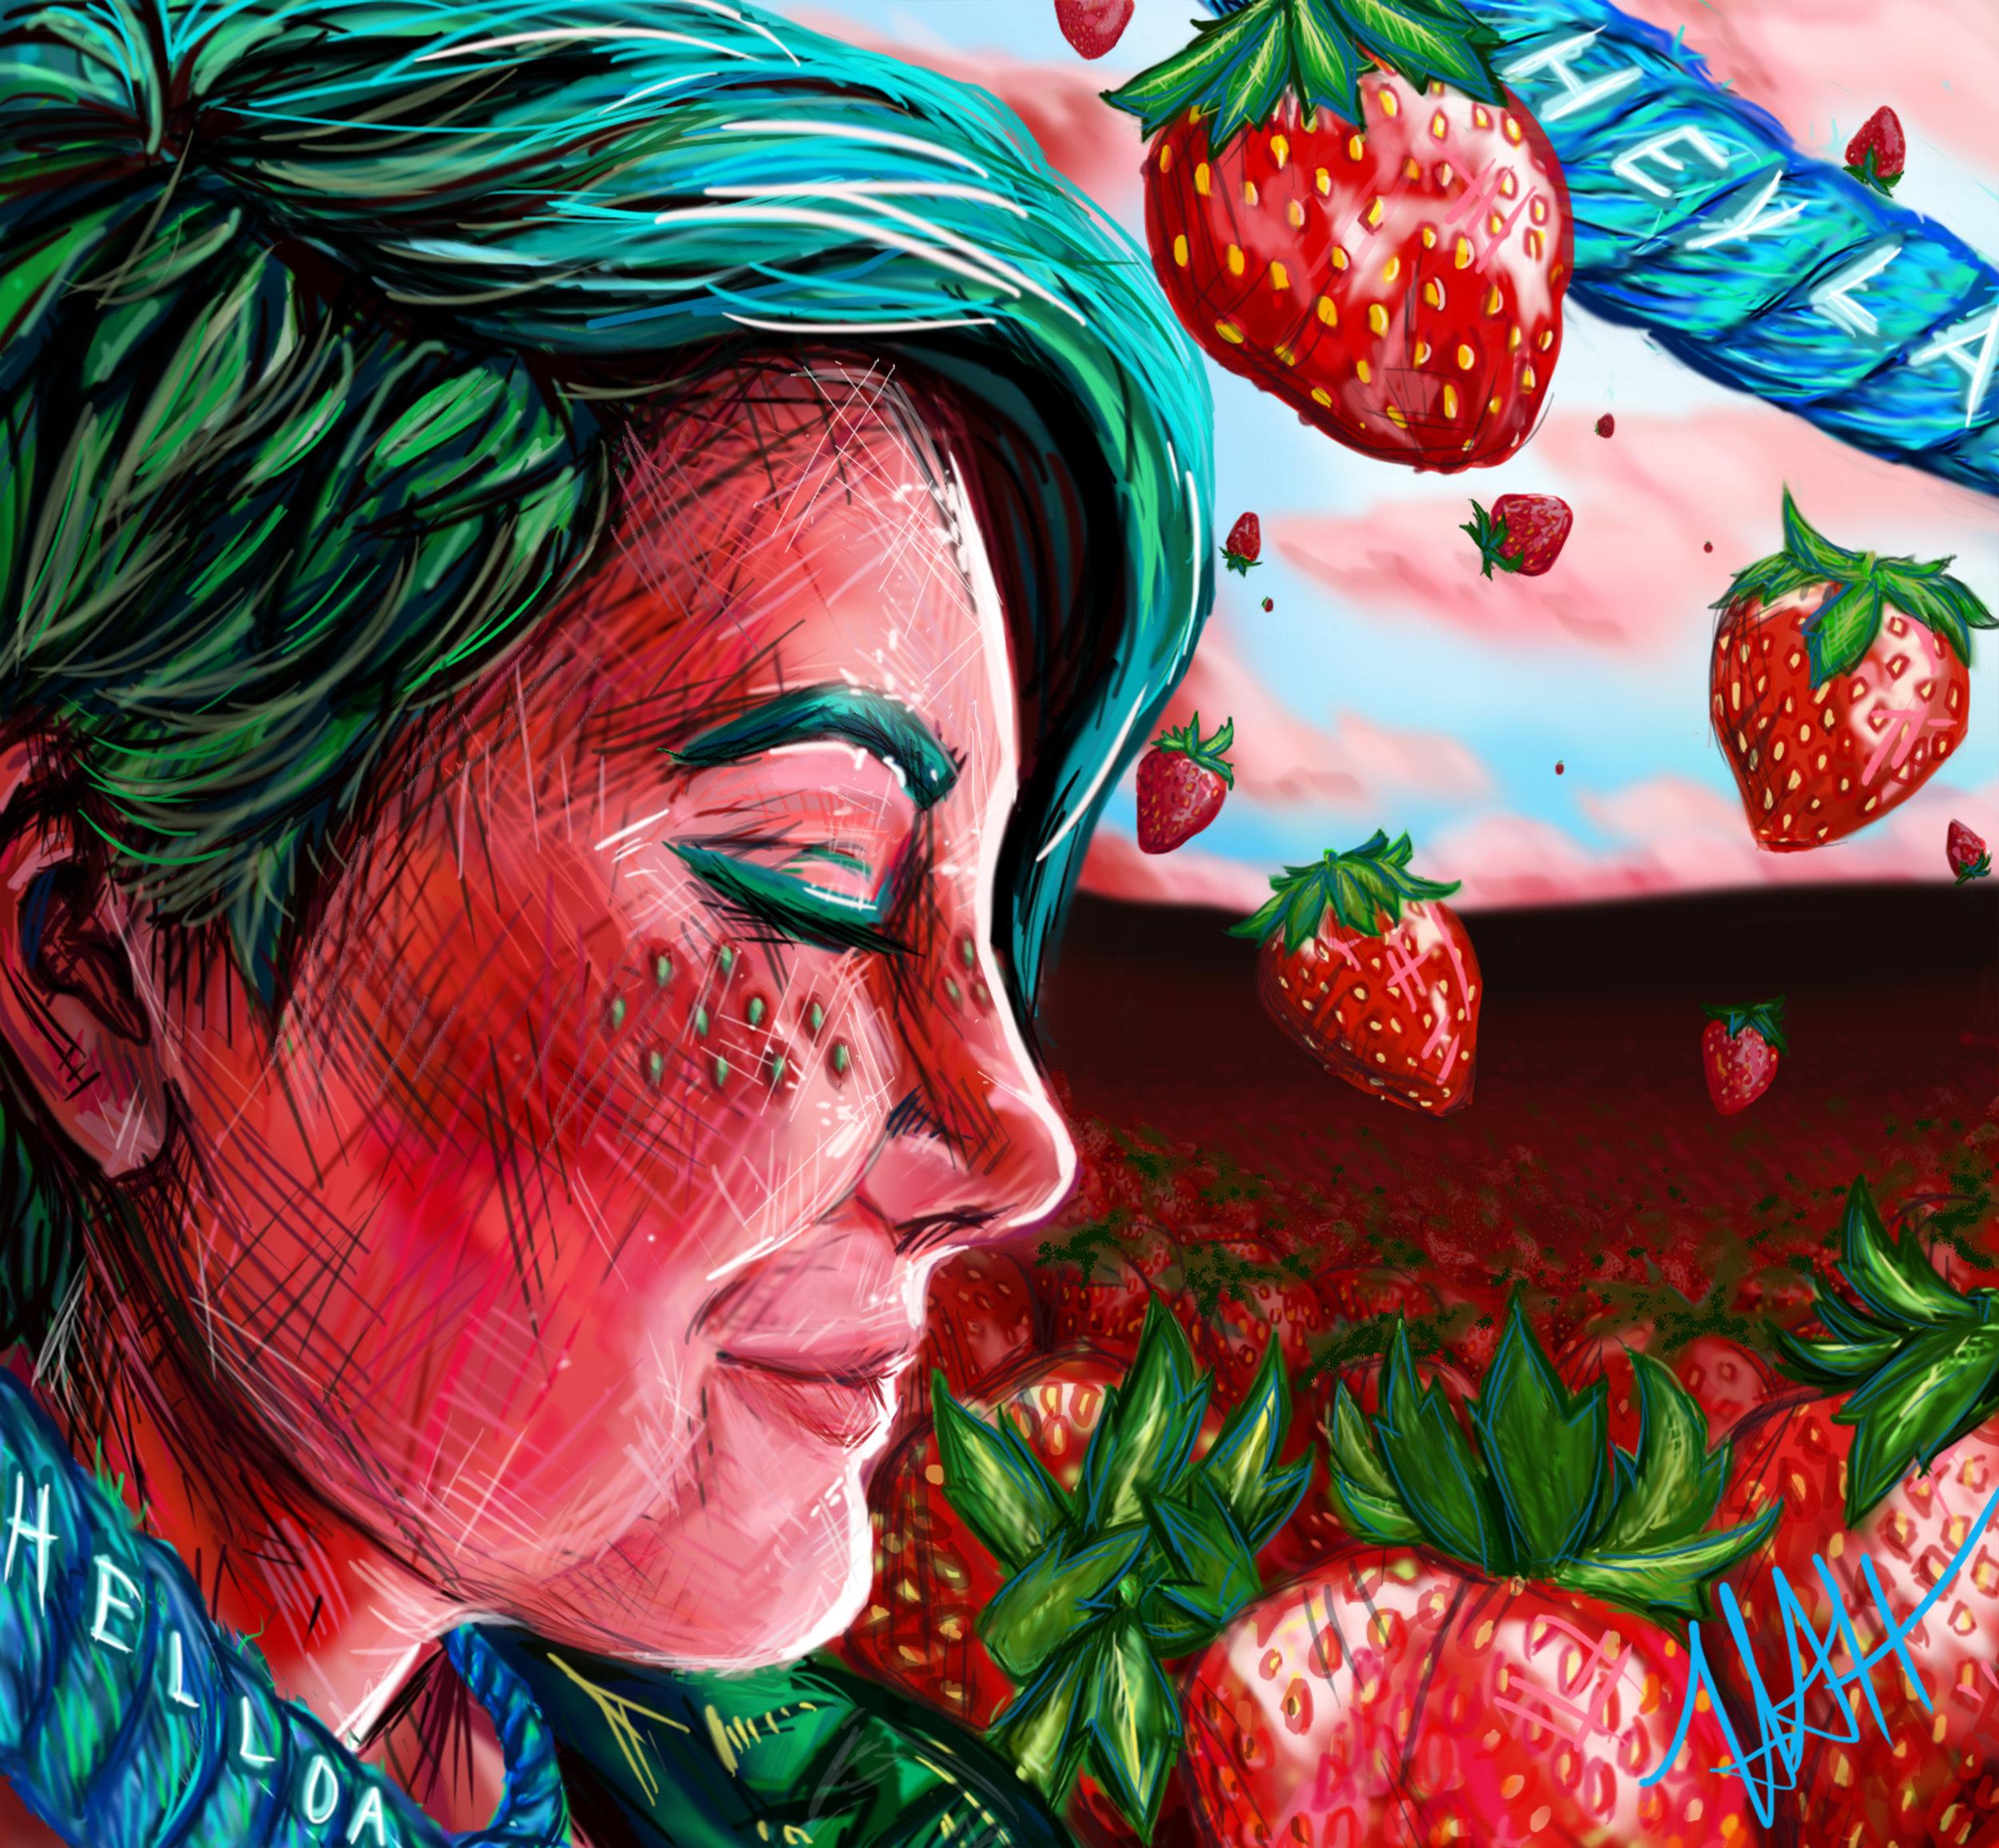 Henning, Heather digital painting Strawberry Fields Forever.jpg